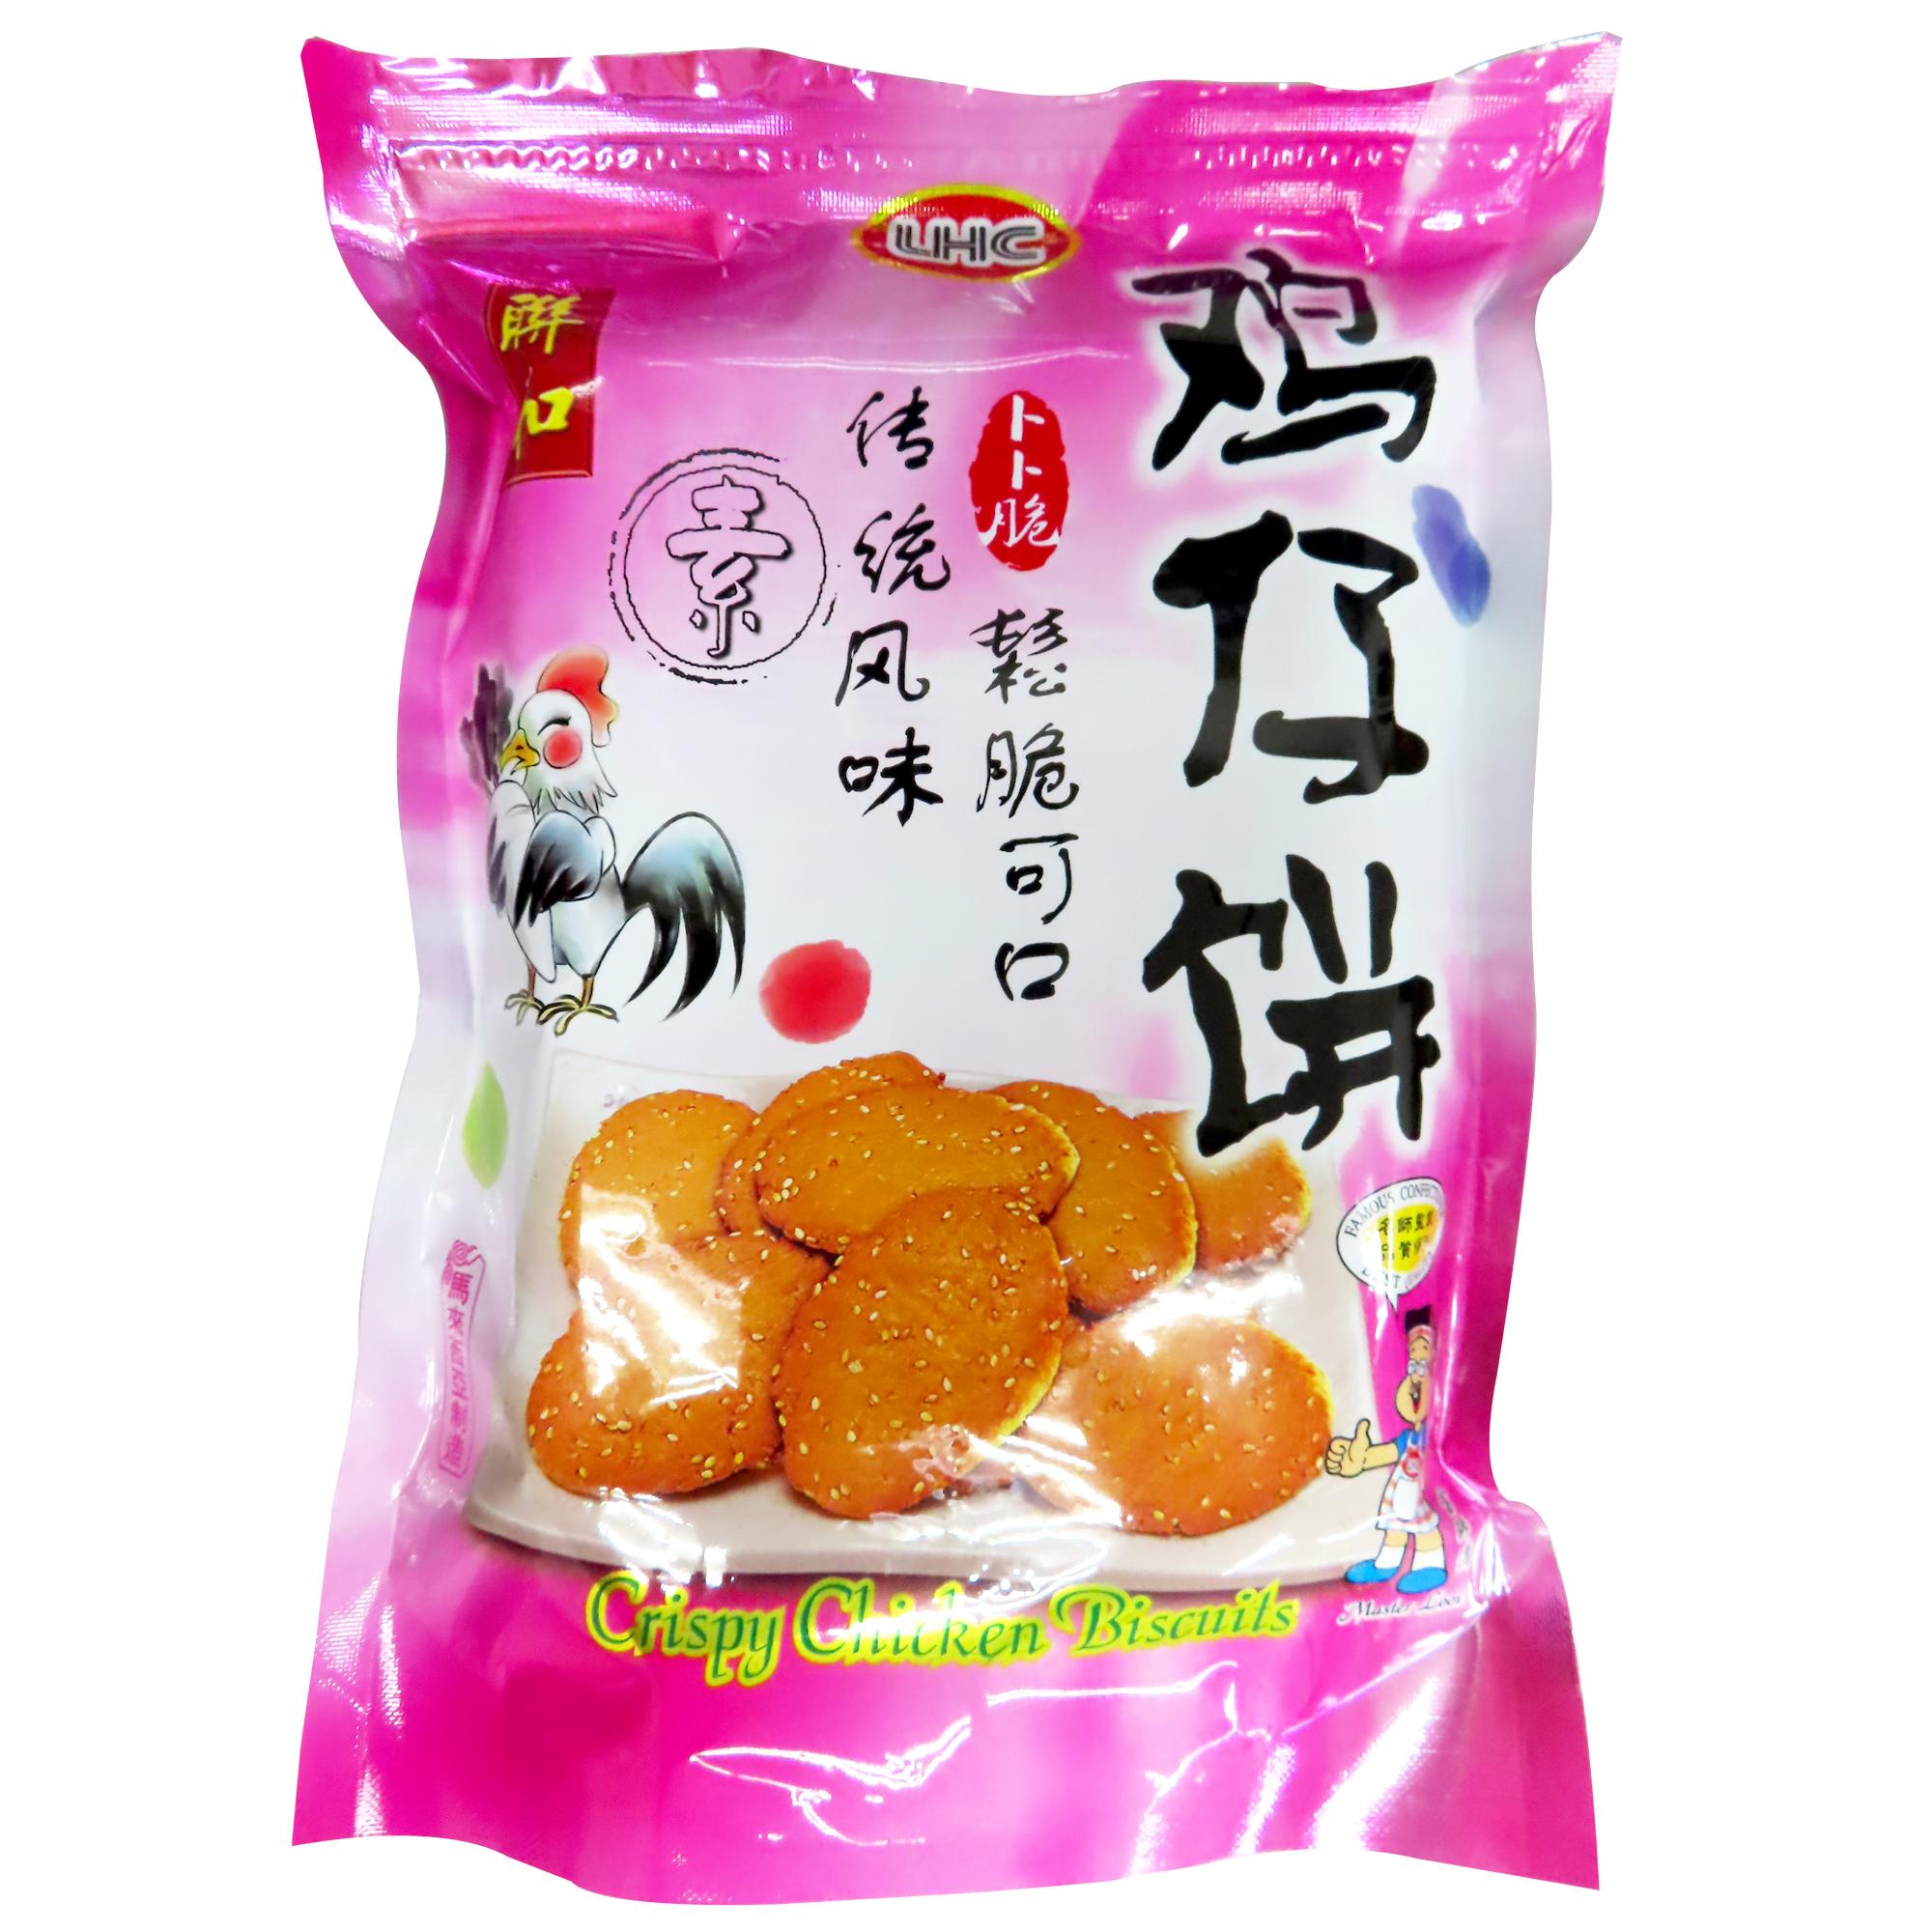 Image Crispy Chicken Biscuits 鸡仔饼 60grams